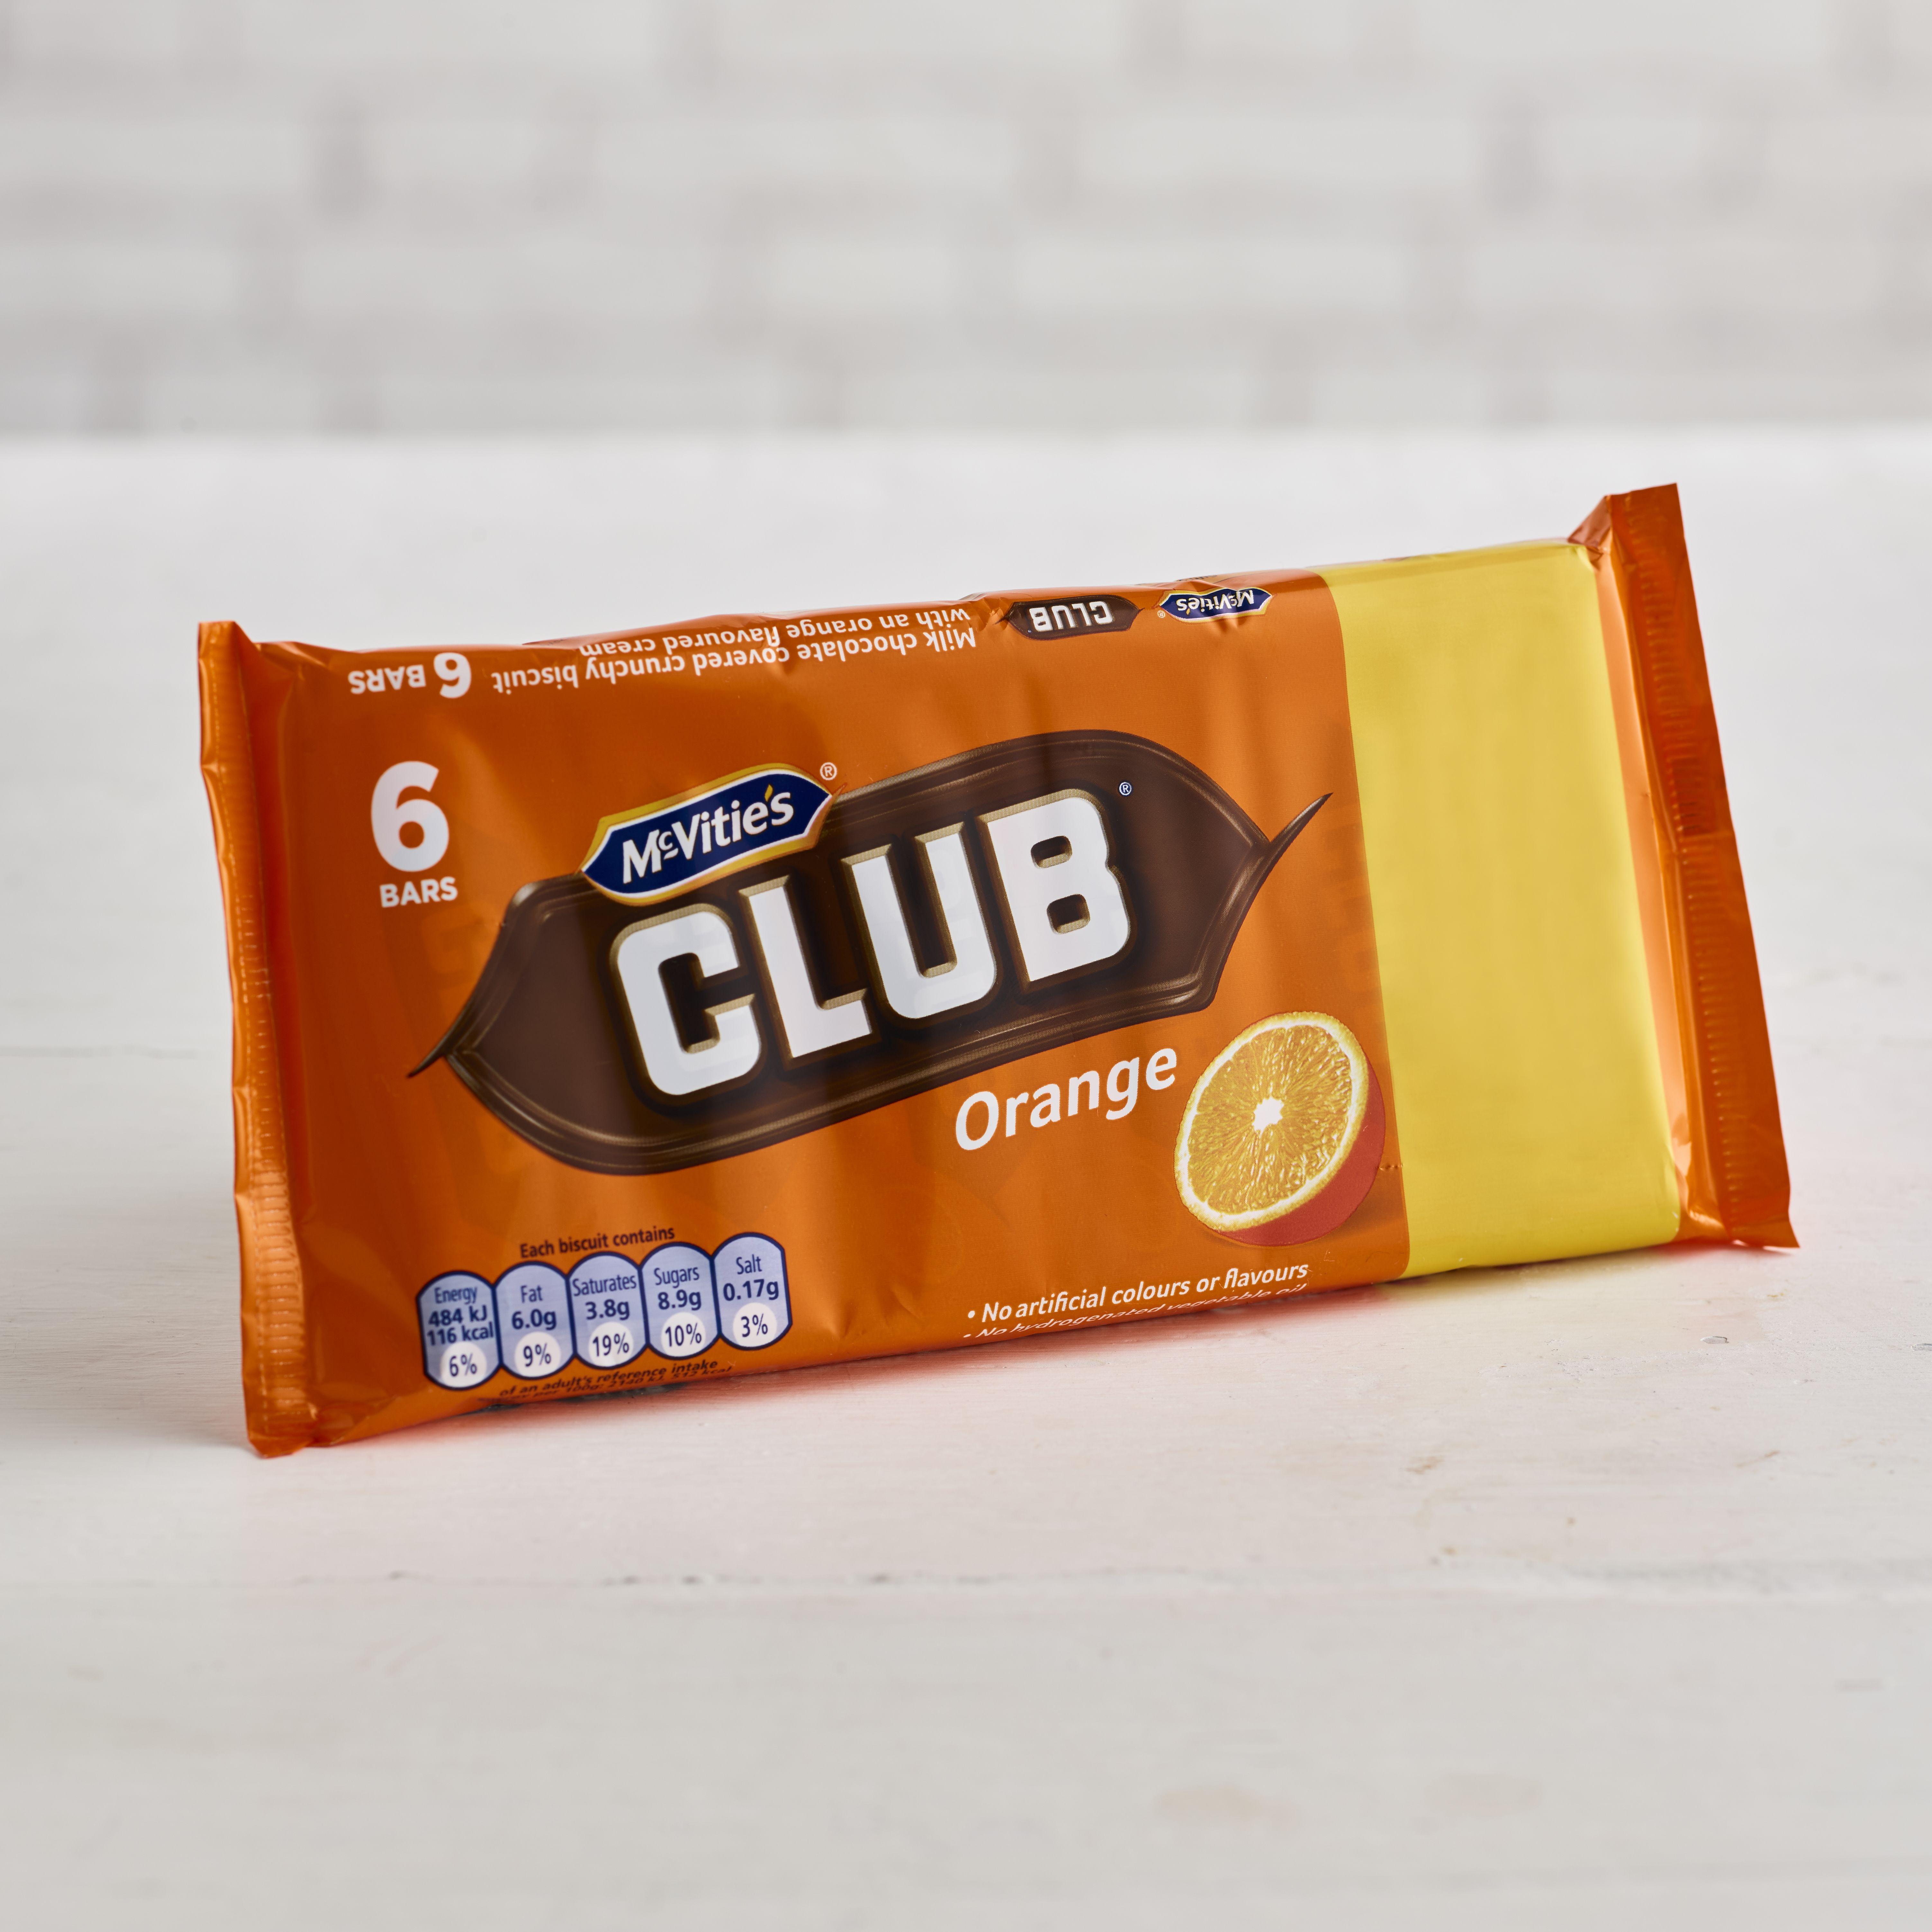 McVitie's Club Orange Chocolate Biscuits, 6 Pack